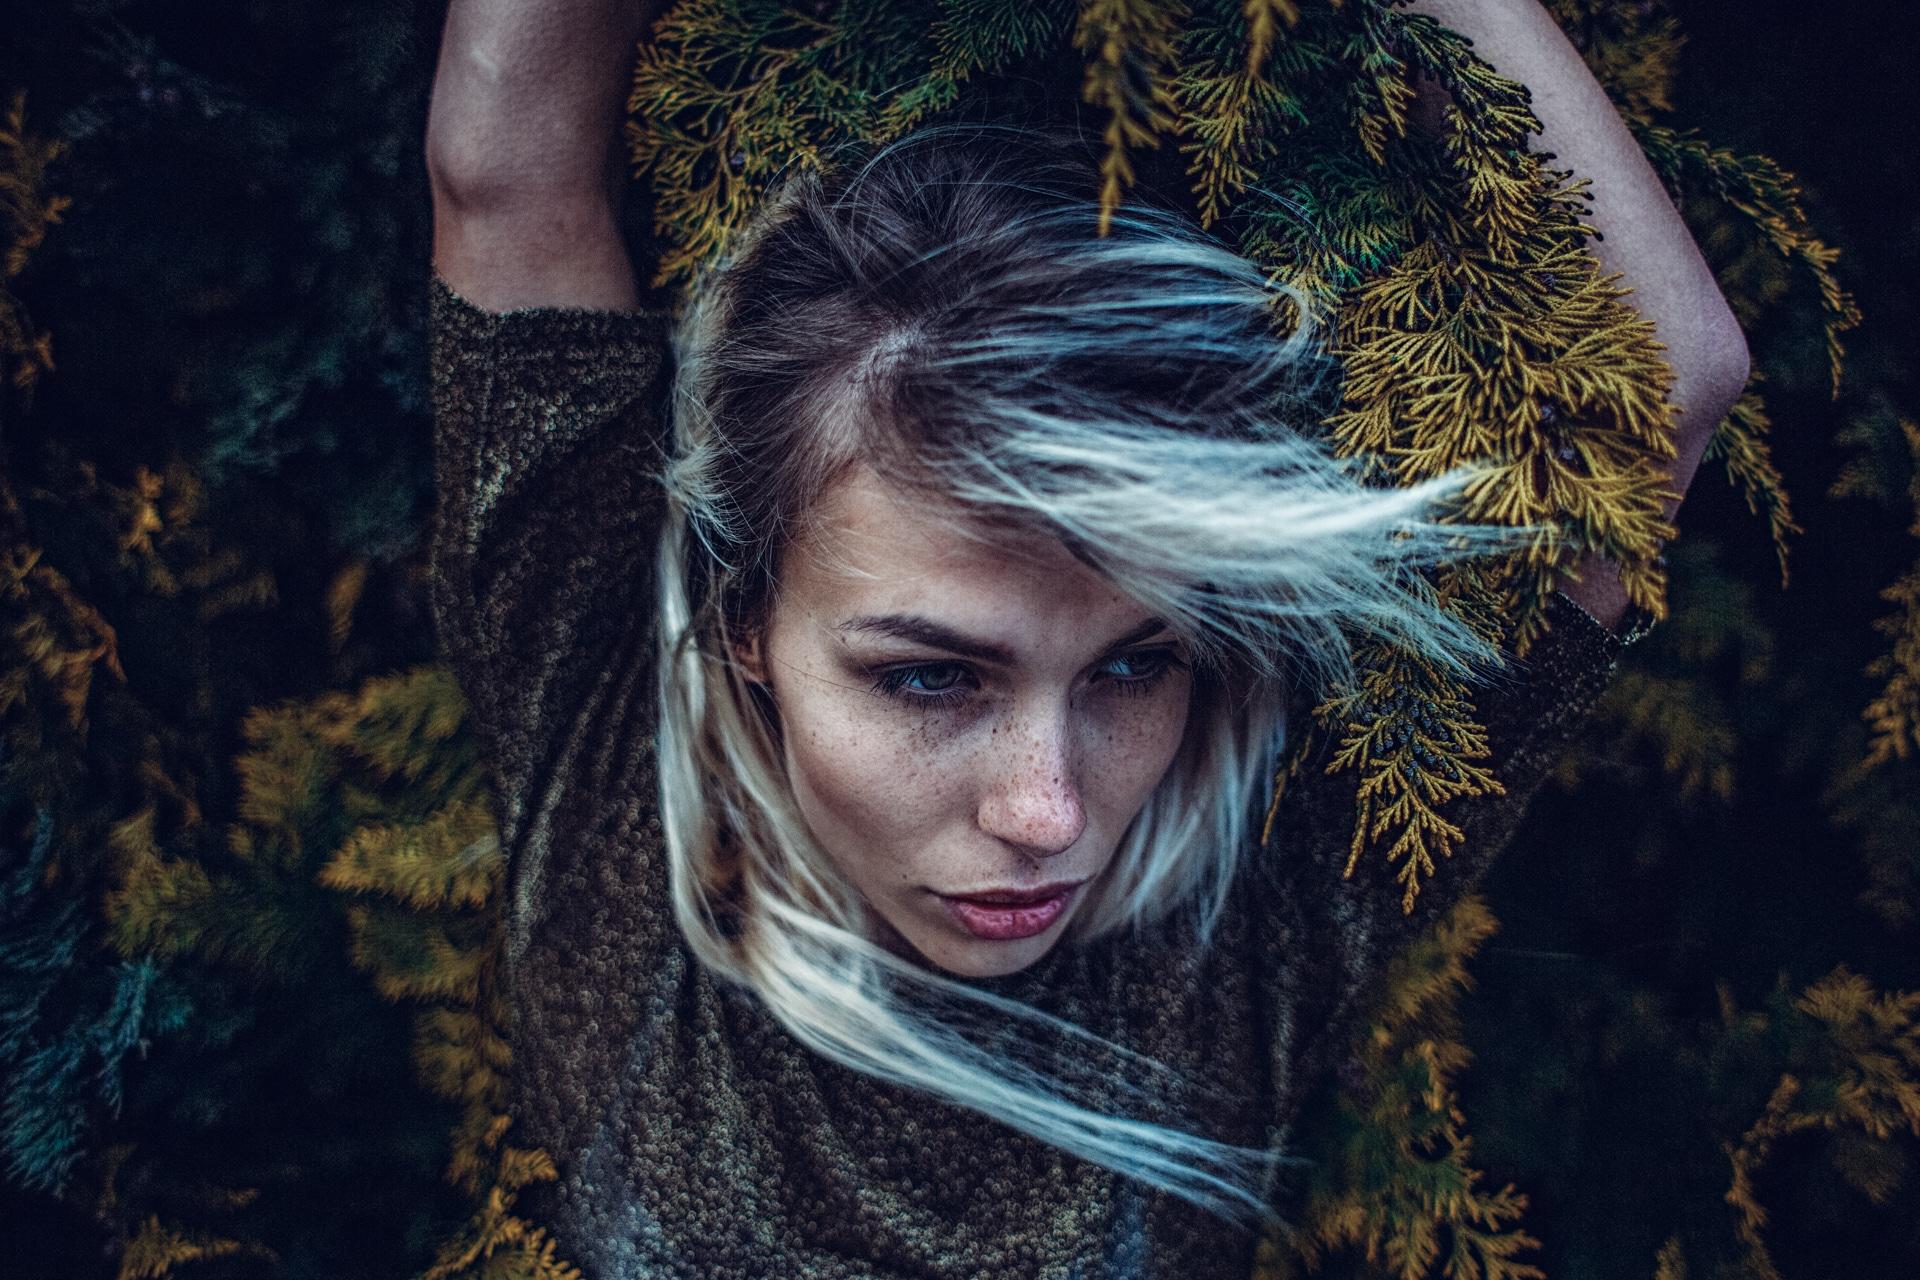 Vanessa-6112-Edit